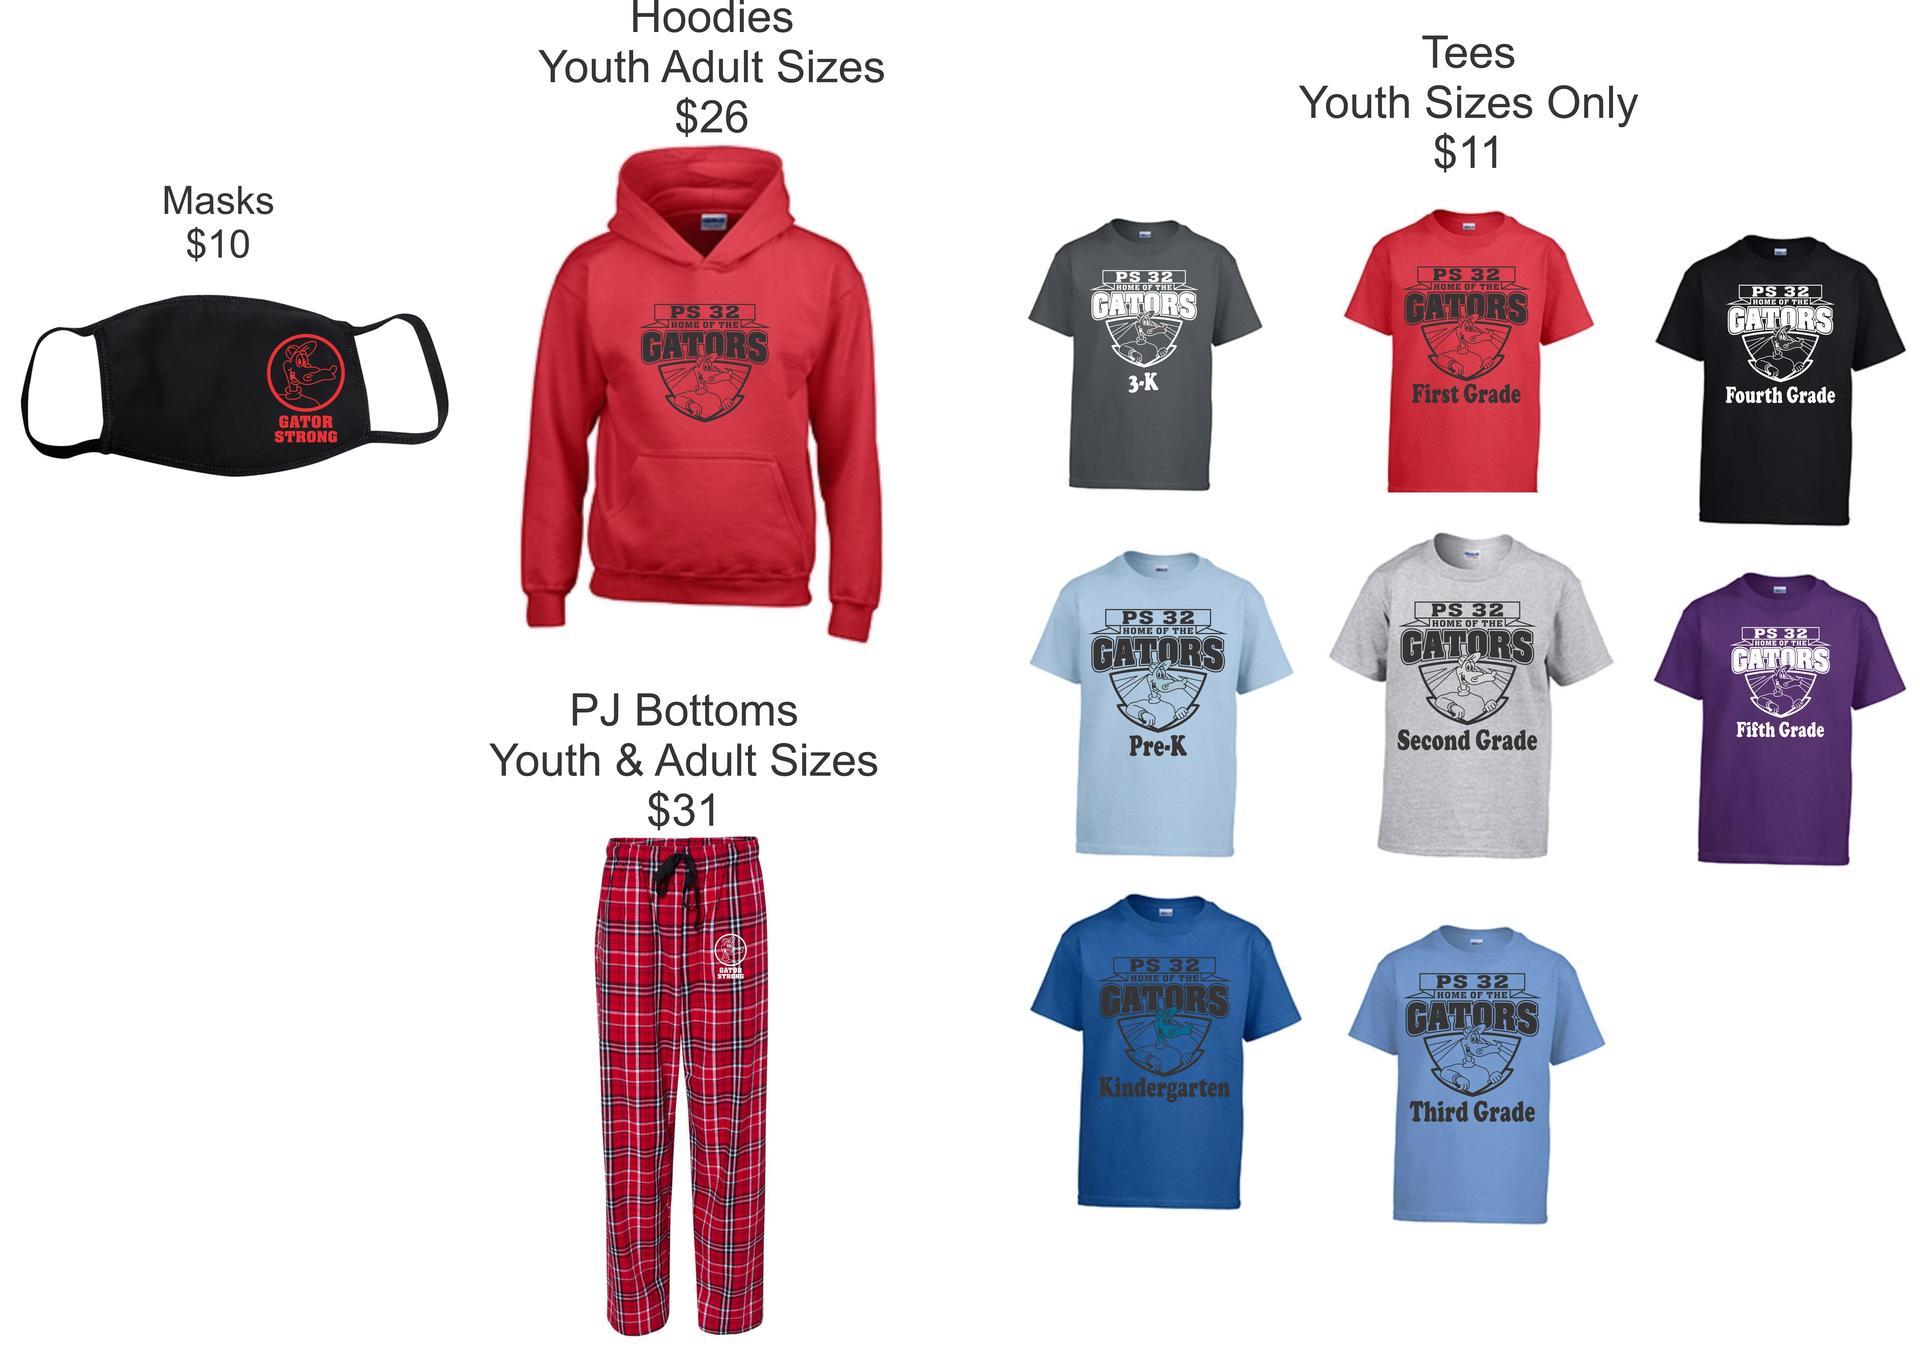 PS32 TShirts, Hoodies & Pants